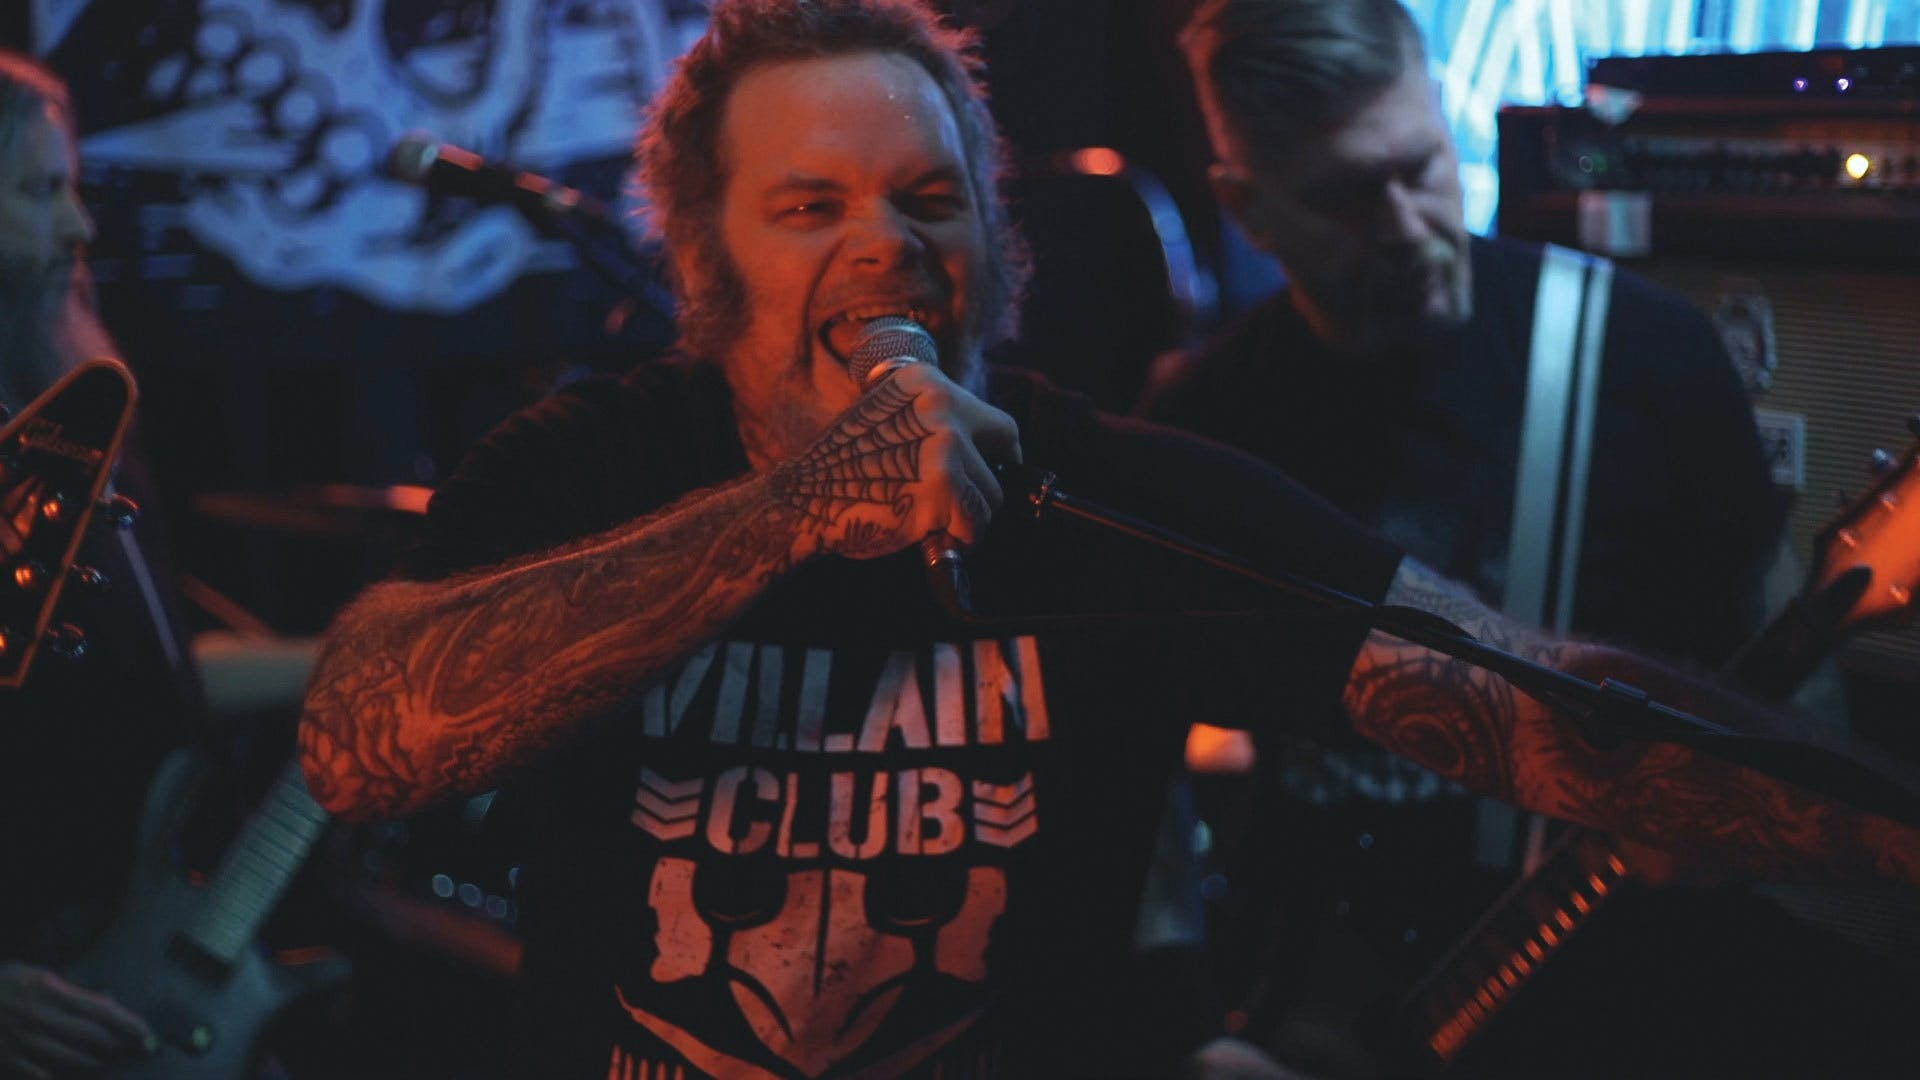 Tonight: Watch Mastodon And Scott Kelly Destroy A Tiny London Bar